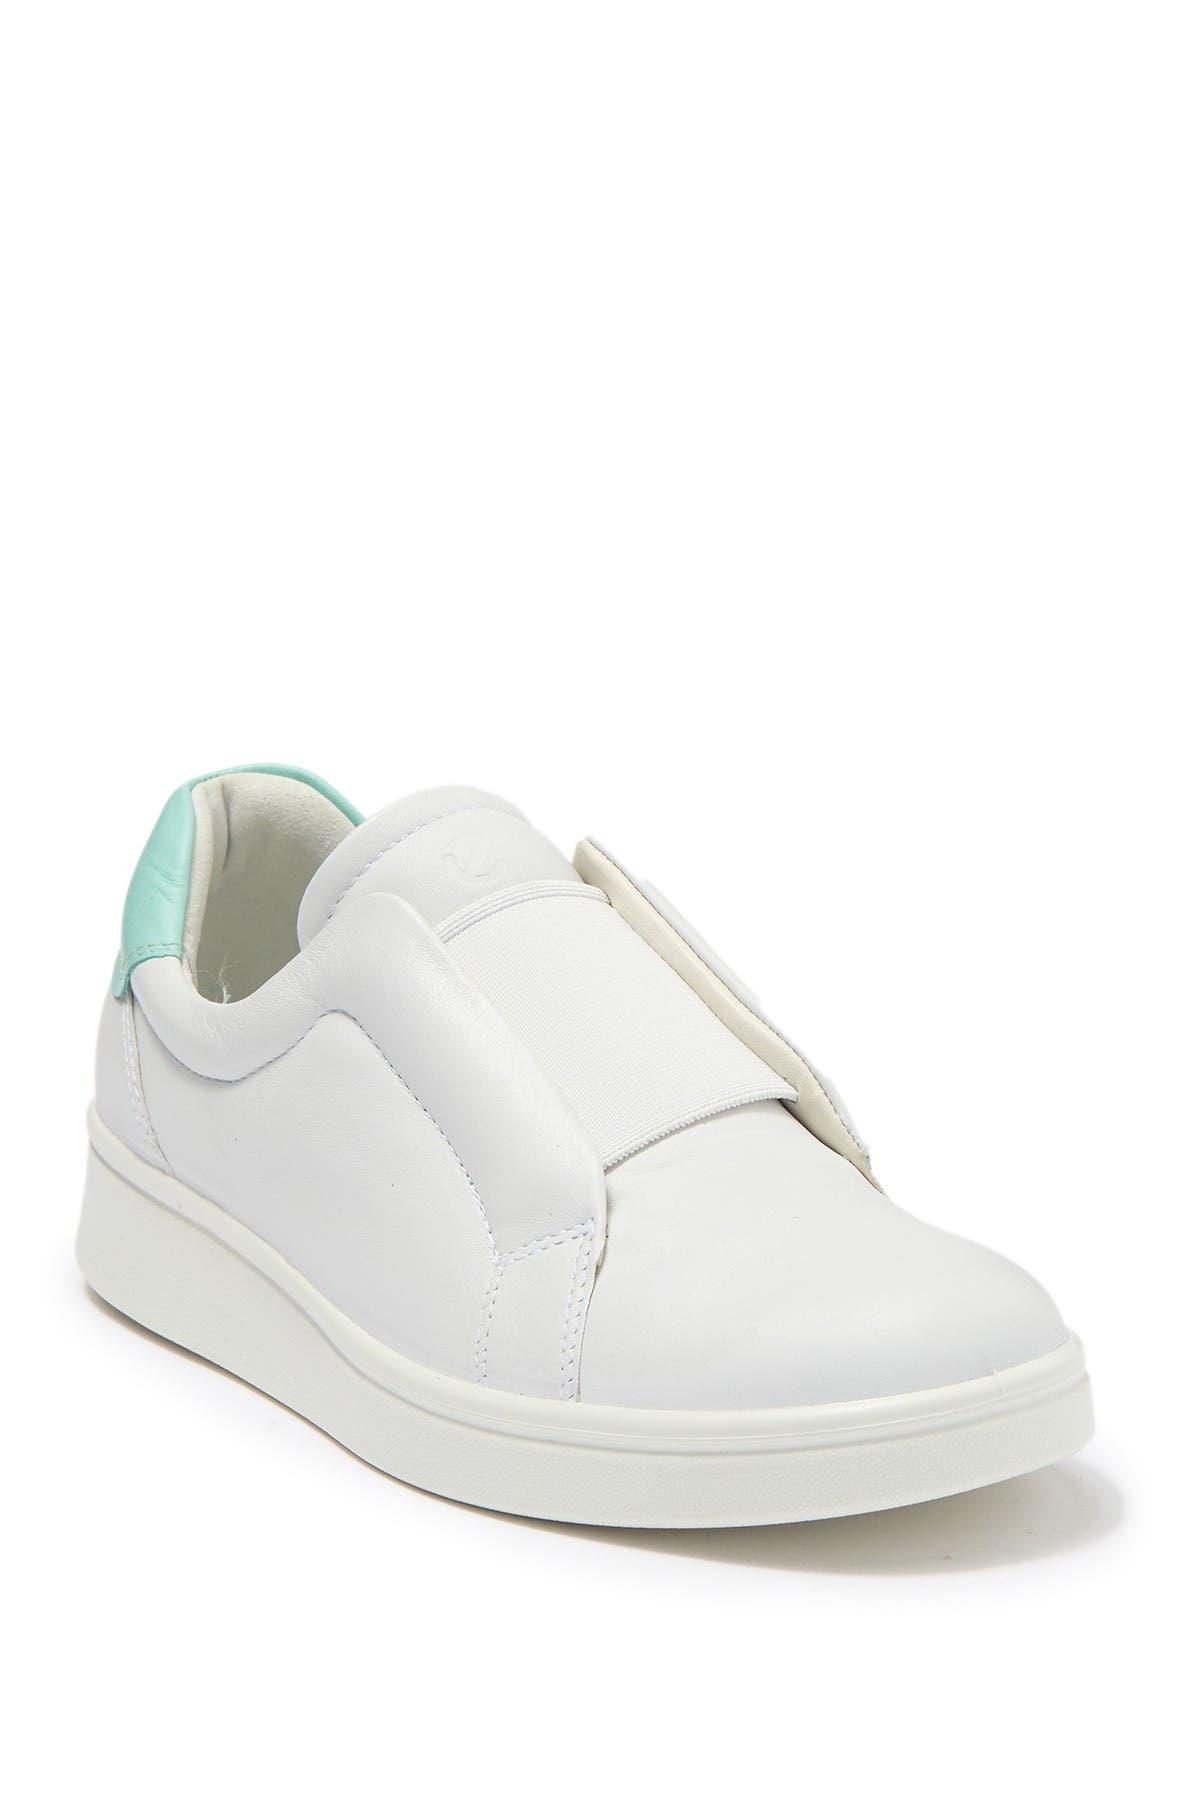 ECCO | Soft 4 Leather Slip-On Sneaker